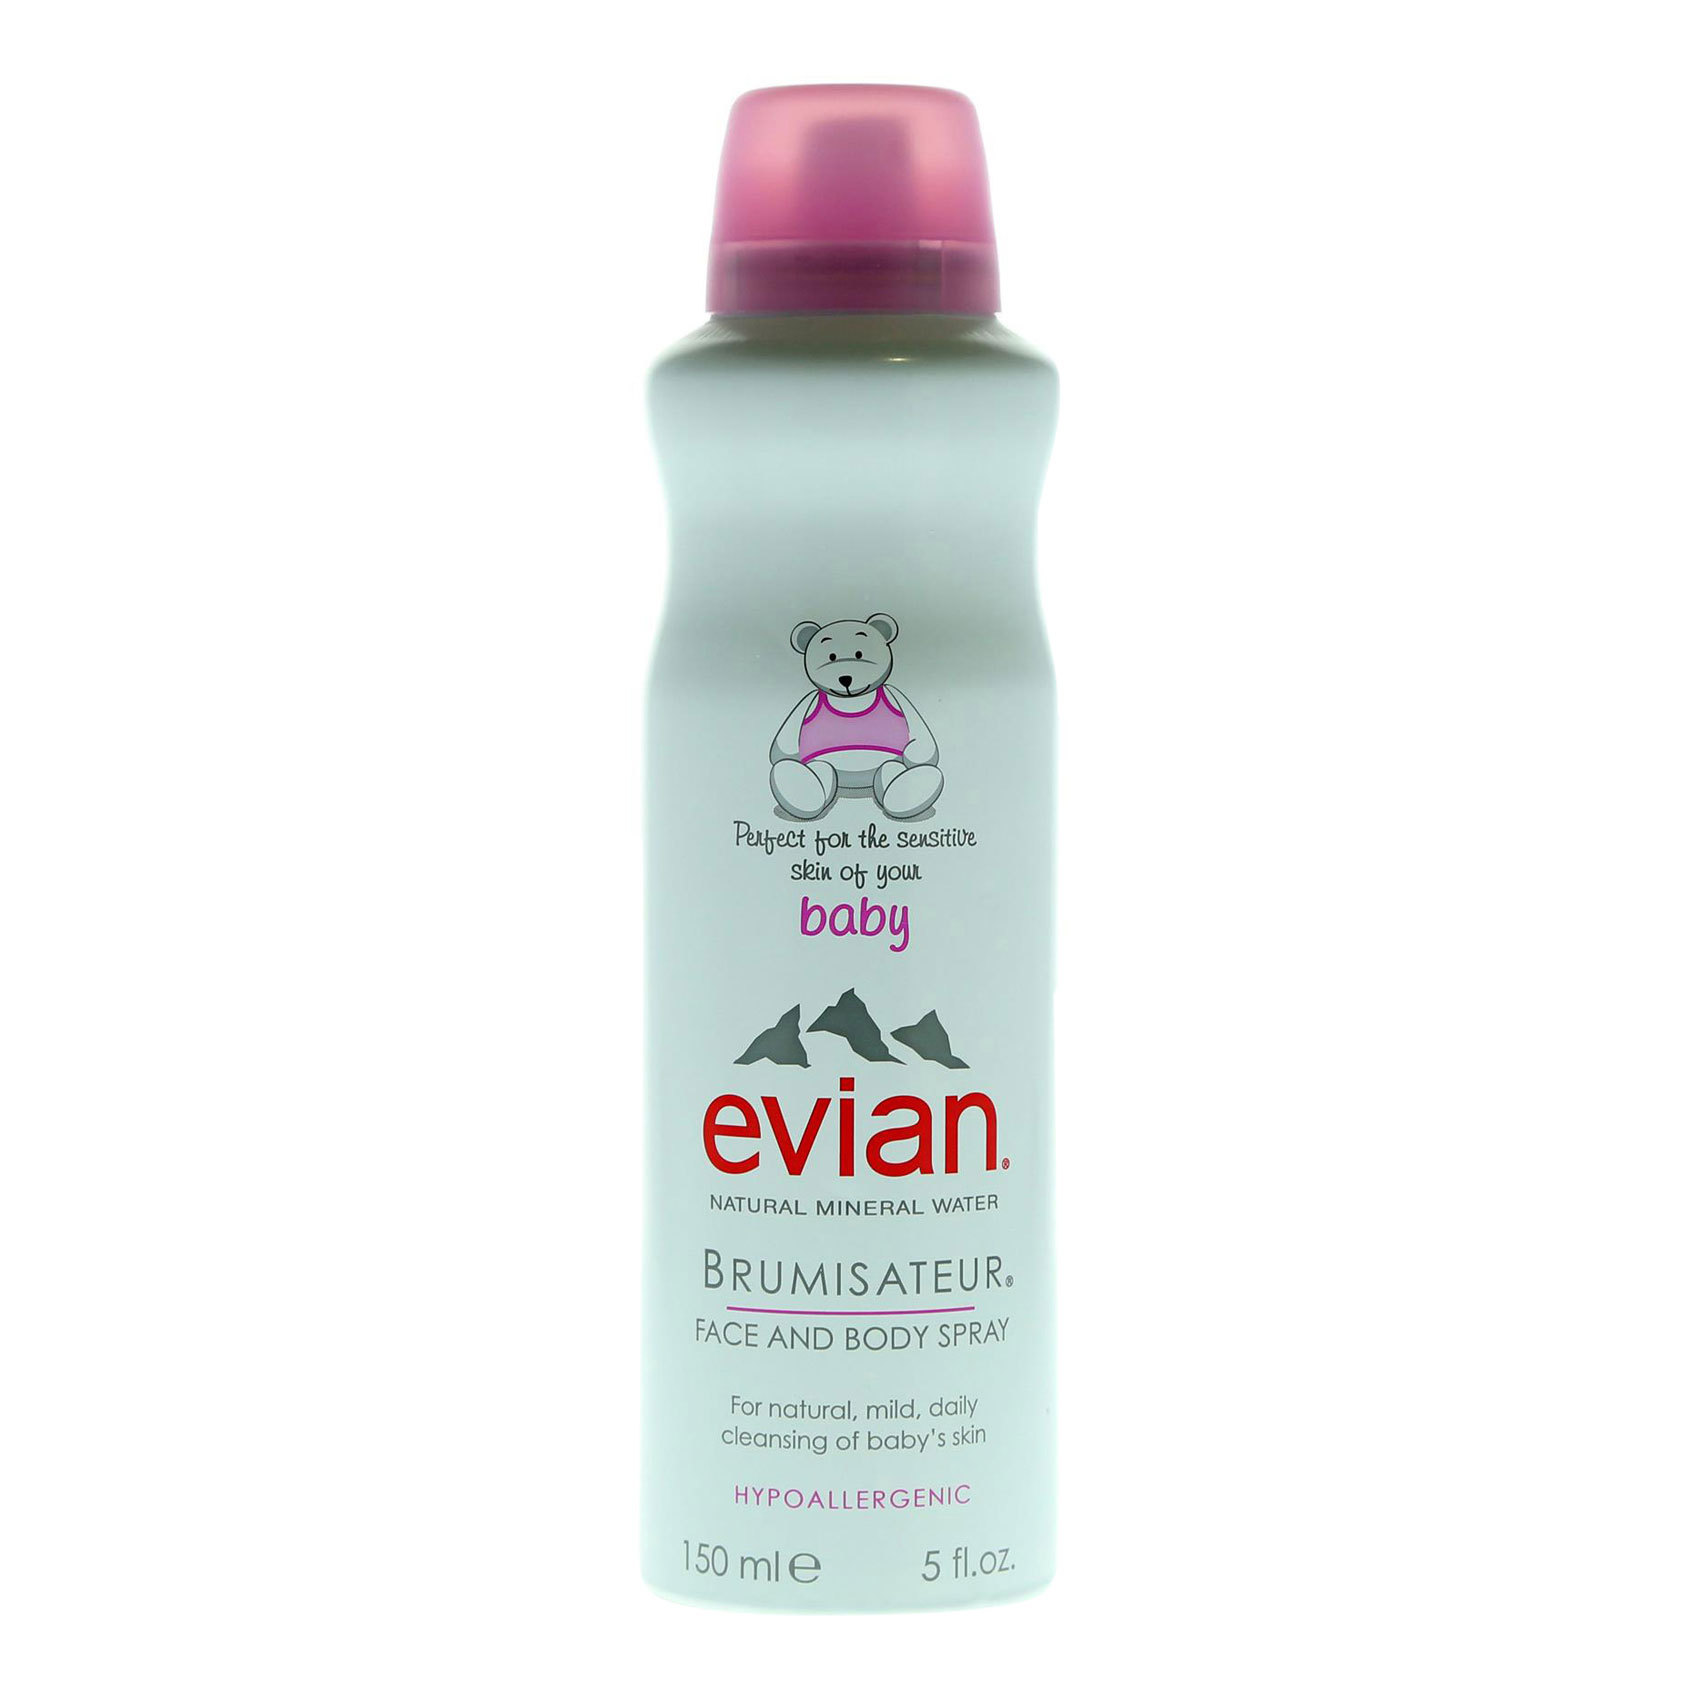 EVIAN BRUMISATEUR BABY 150ML